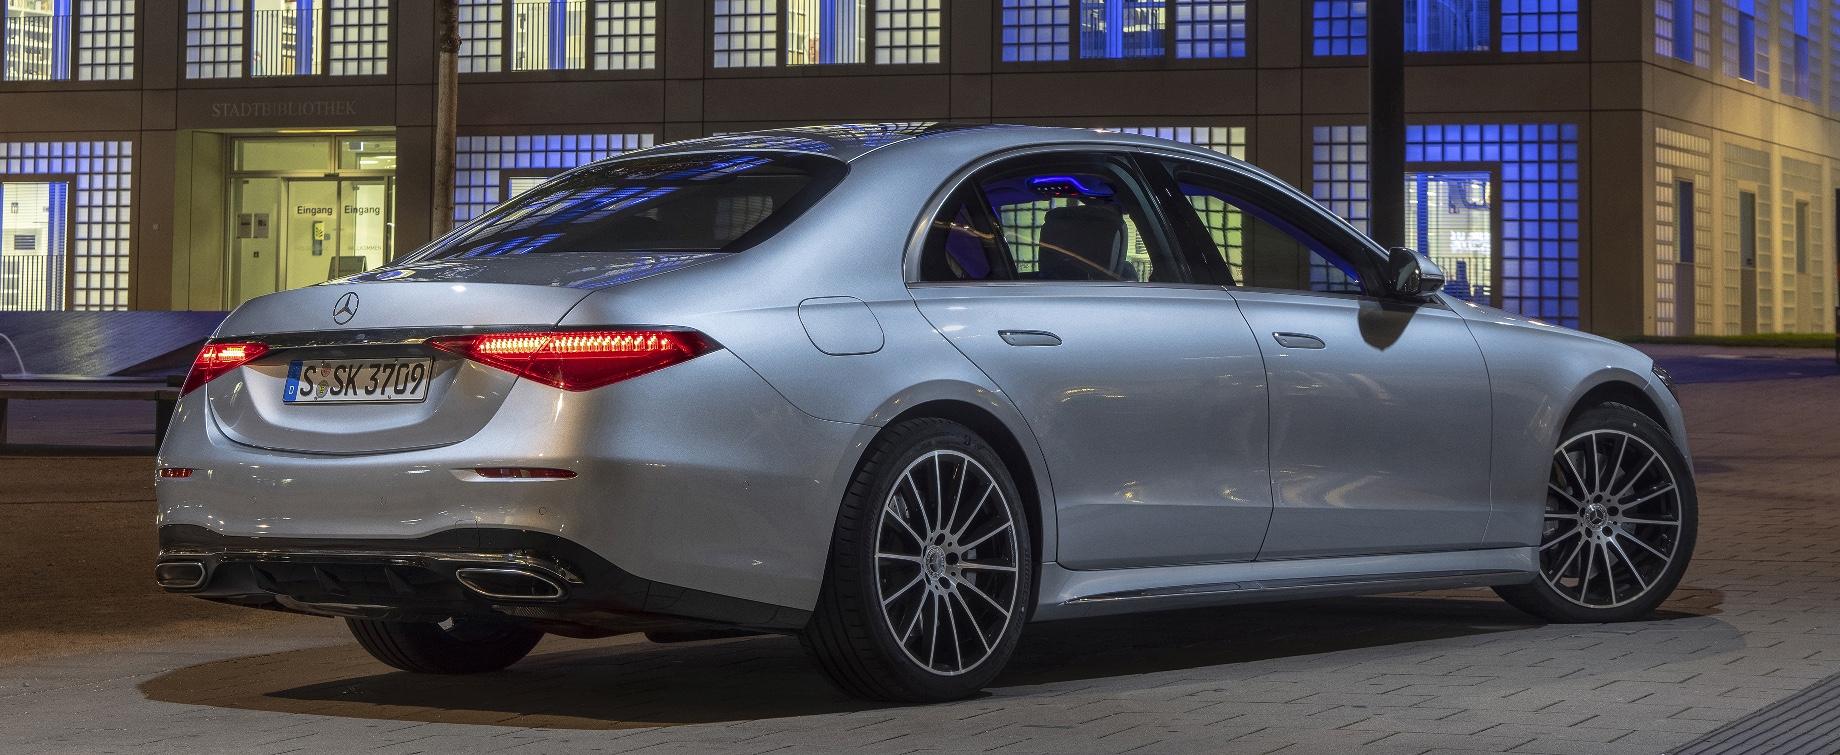 Mercedes S-класса c V8 оказался заметно дороже конкурентов